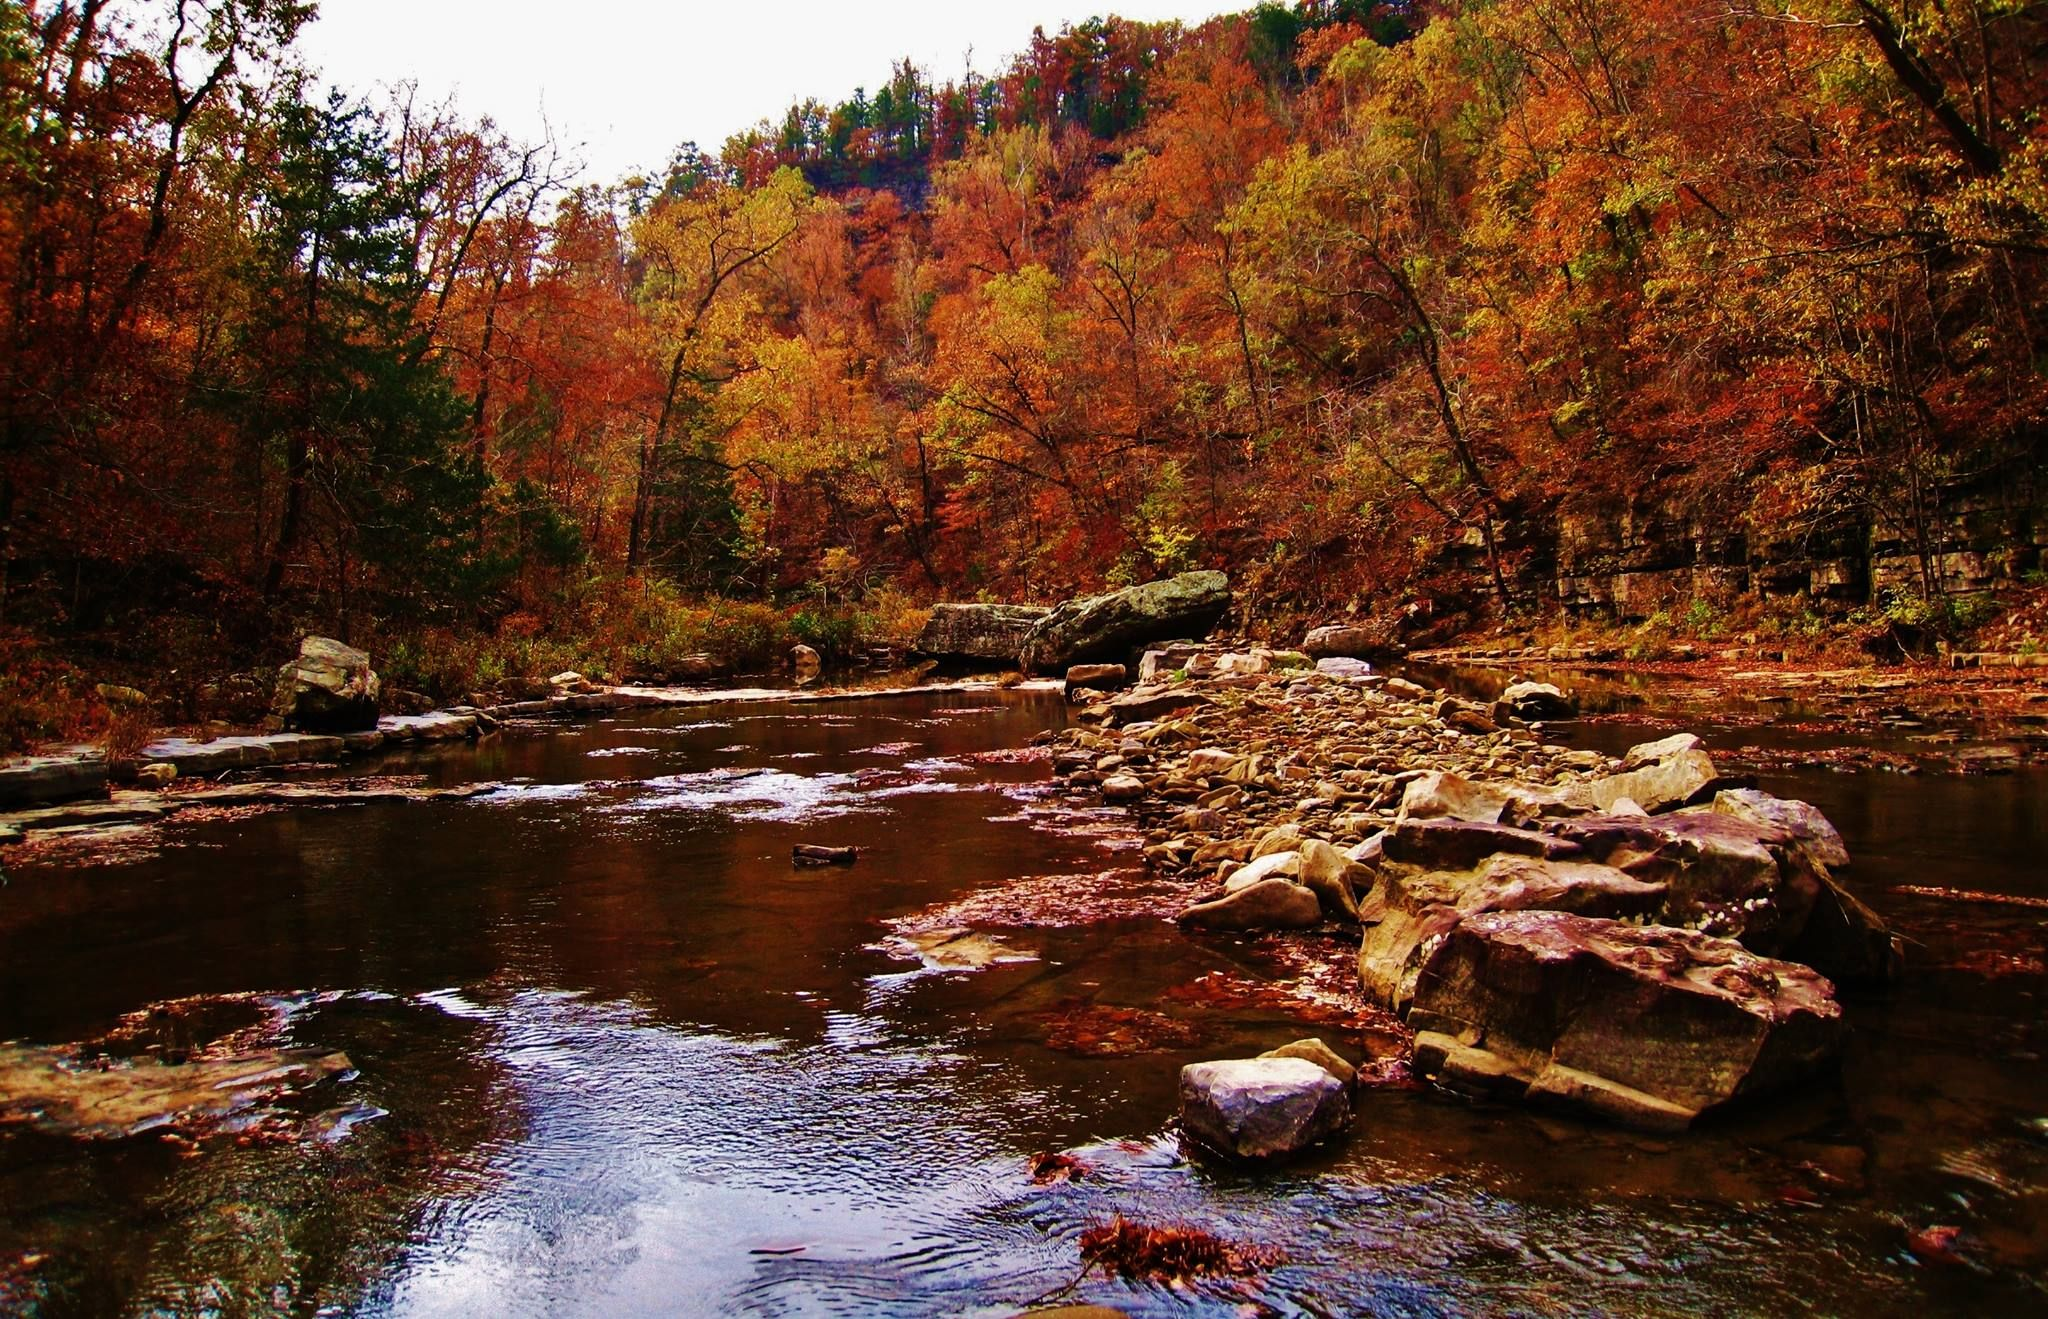 Richland Creek Wilderness Area, Arkansas Hiking spots